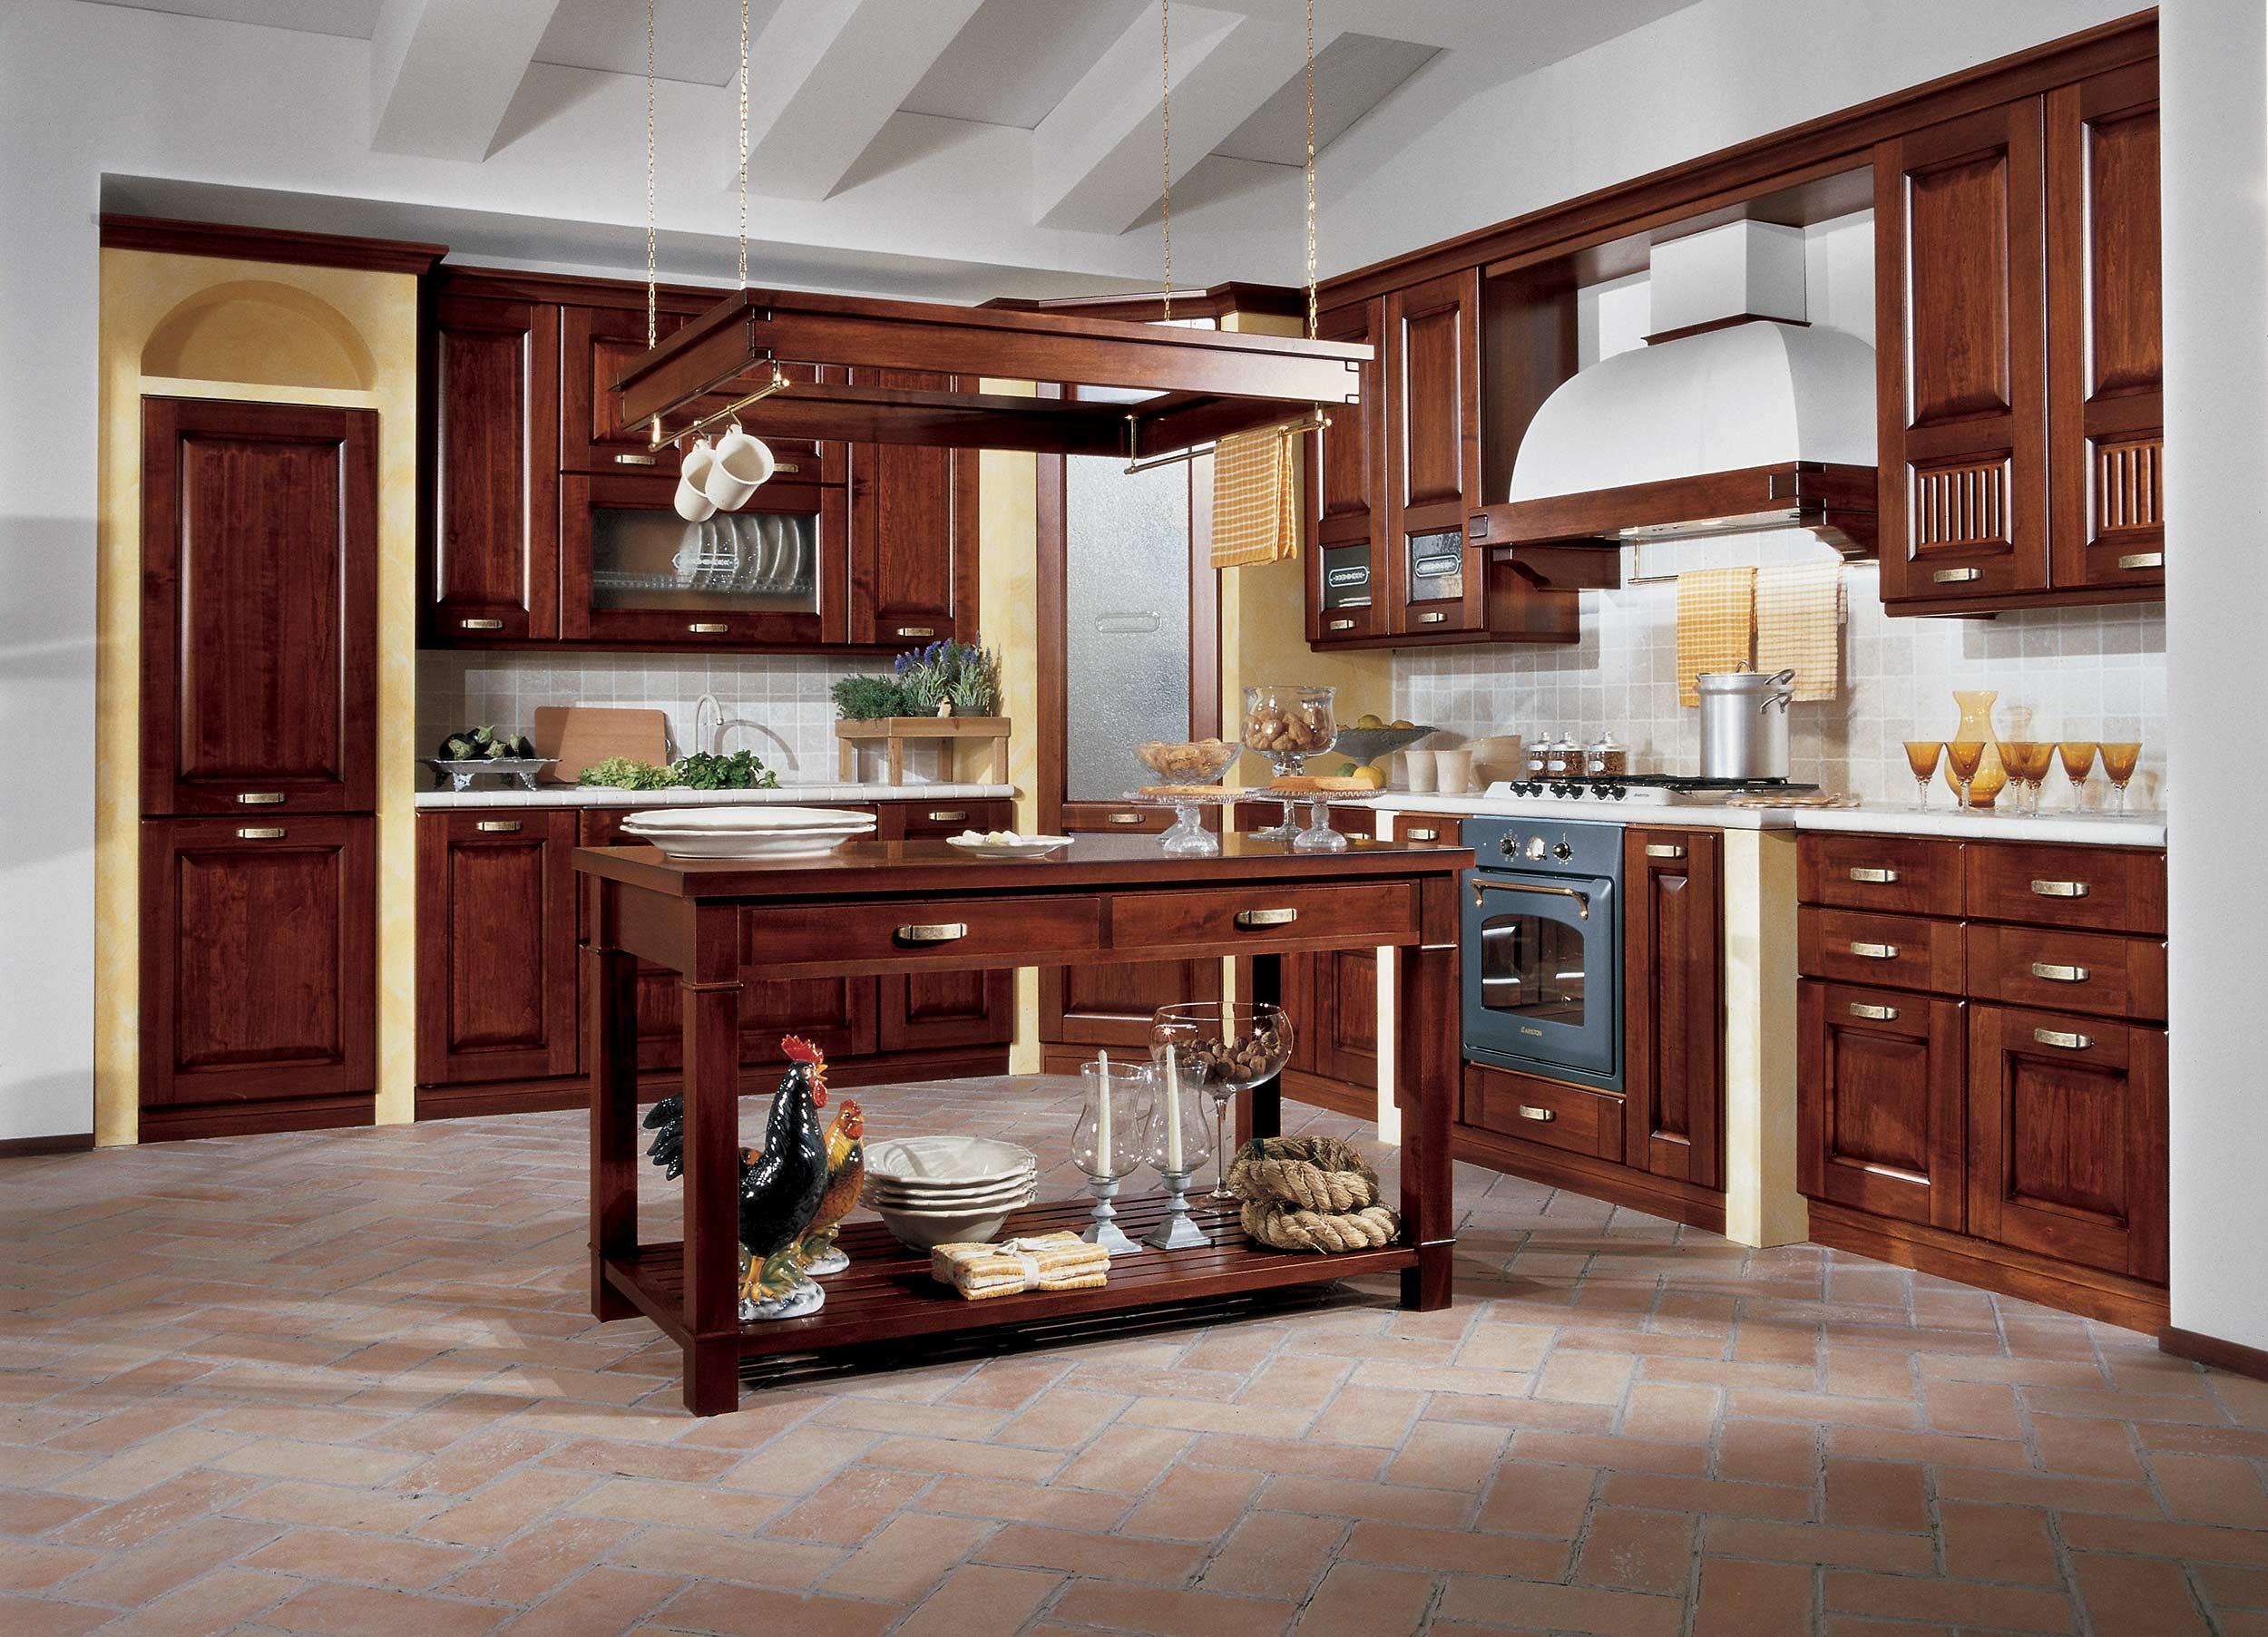 Cucina Stosa Malaga - Lorenzelli Arredamenti